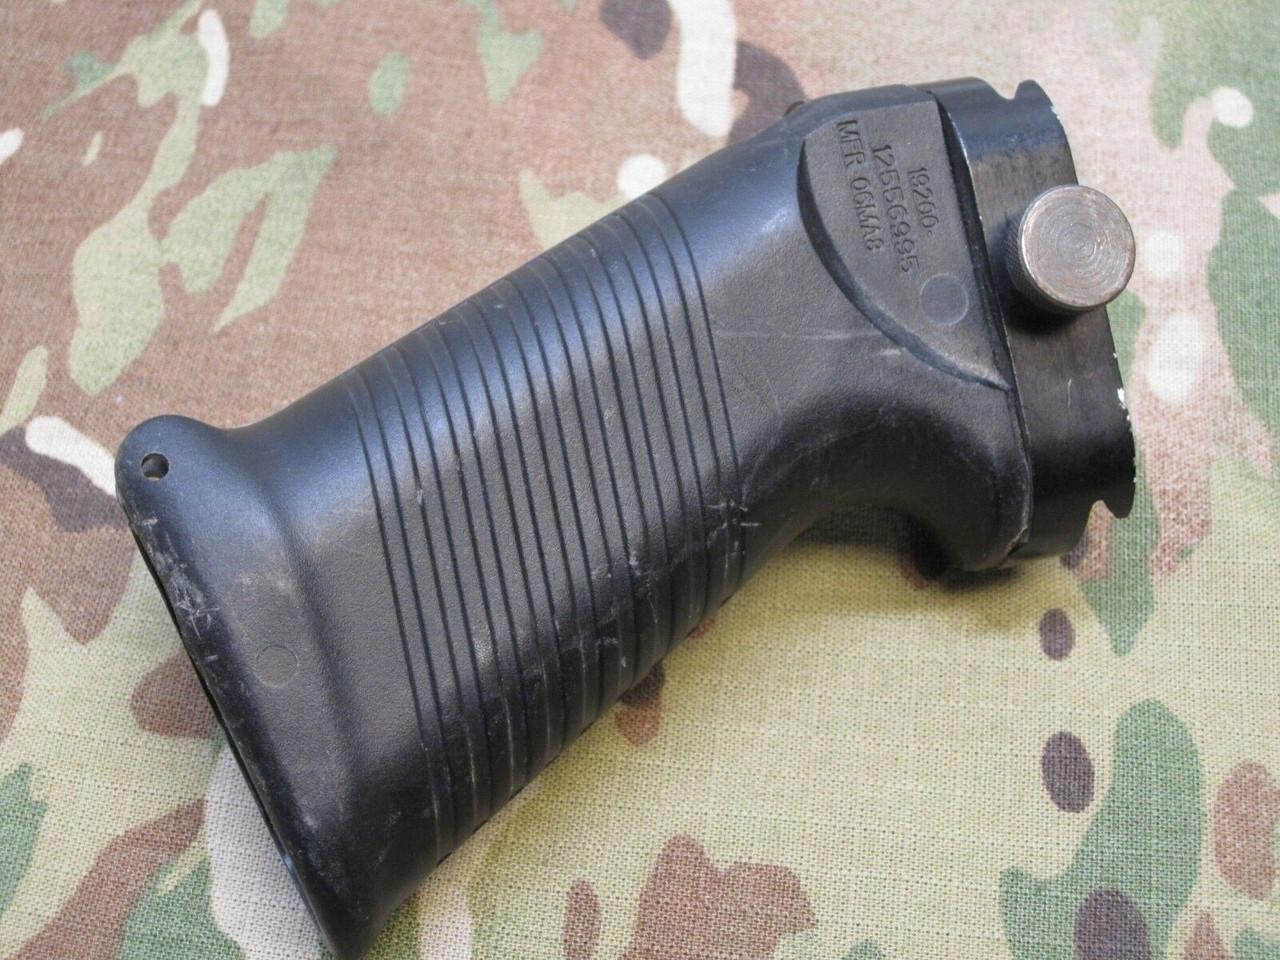 Military Picatinny SAW Rail Mount Front Pistol Grip 19200-12556995 MFR 06MA8